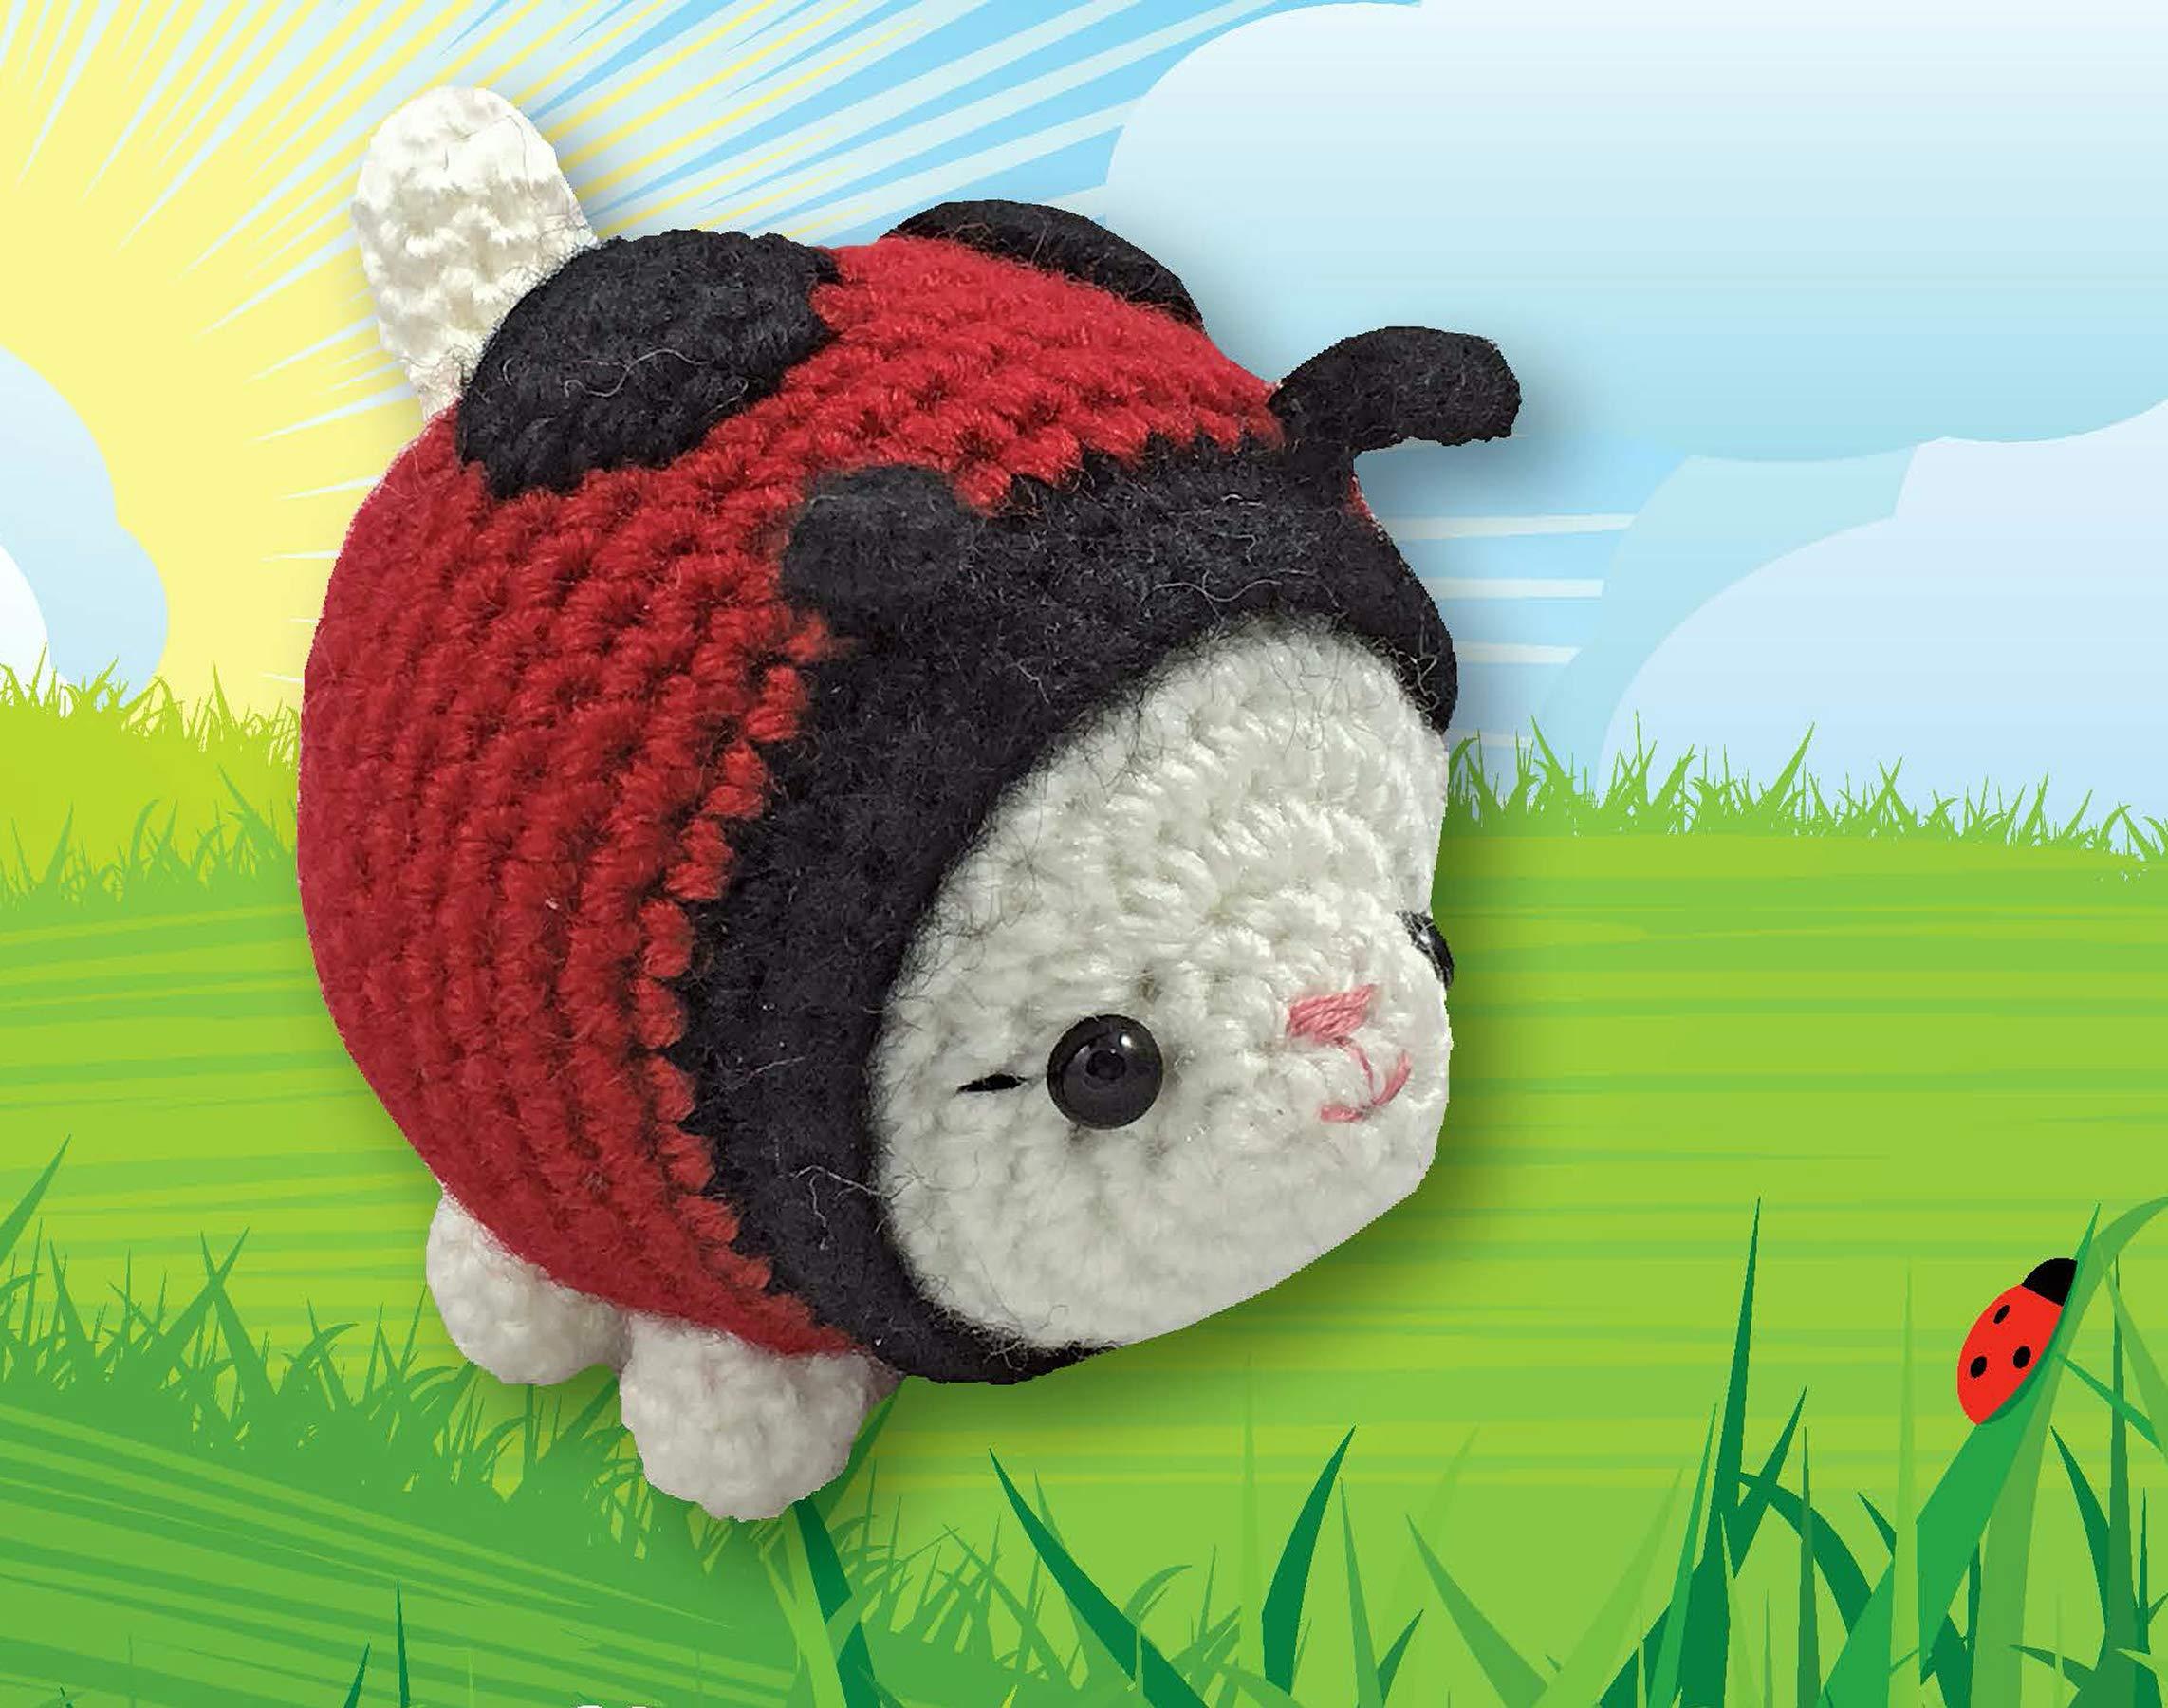 Easy Crochet Amigurumi Tutorial - Dumpling - YouTube | 1800x2285